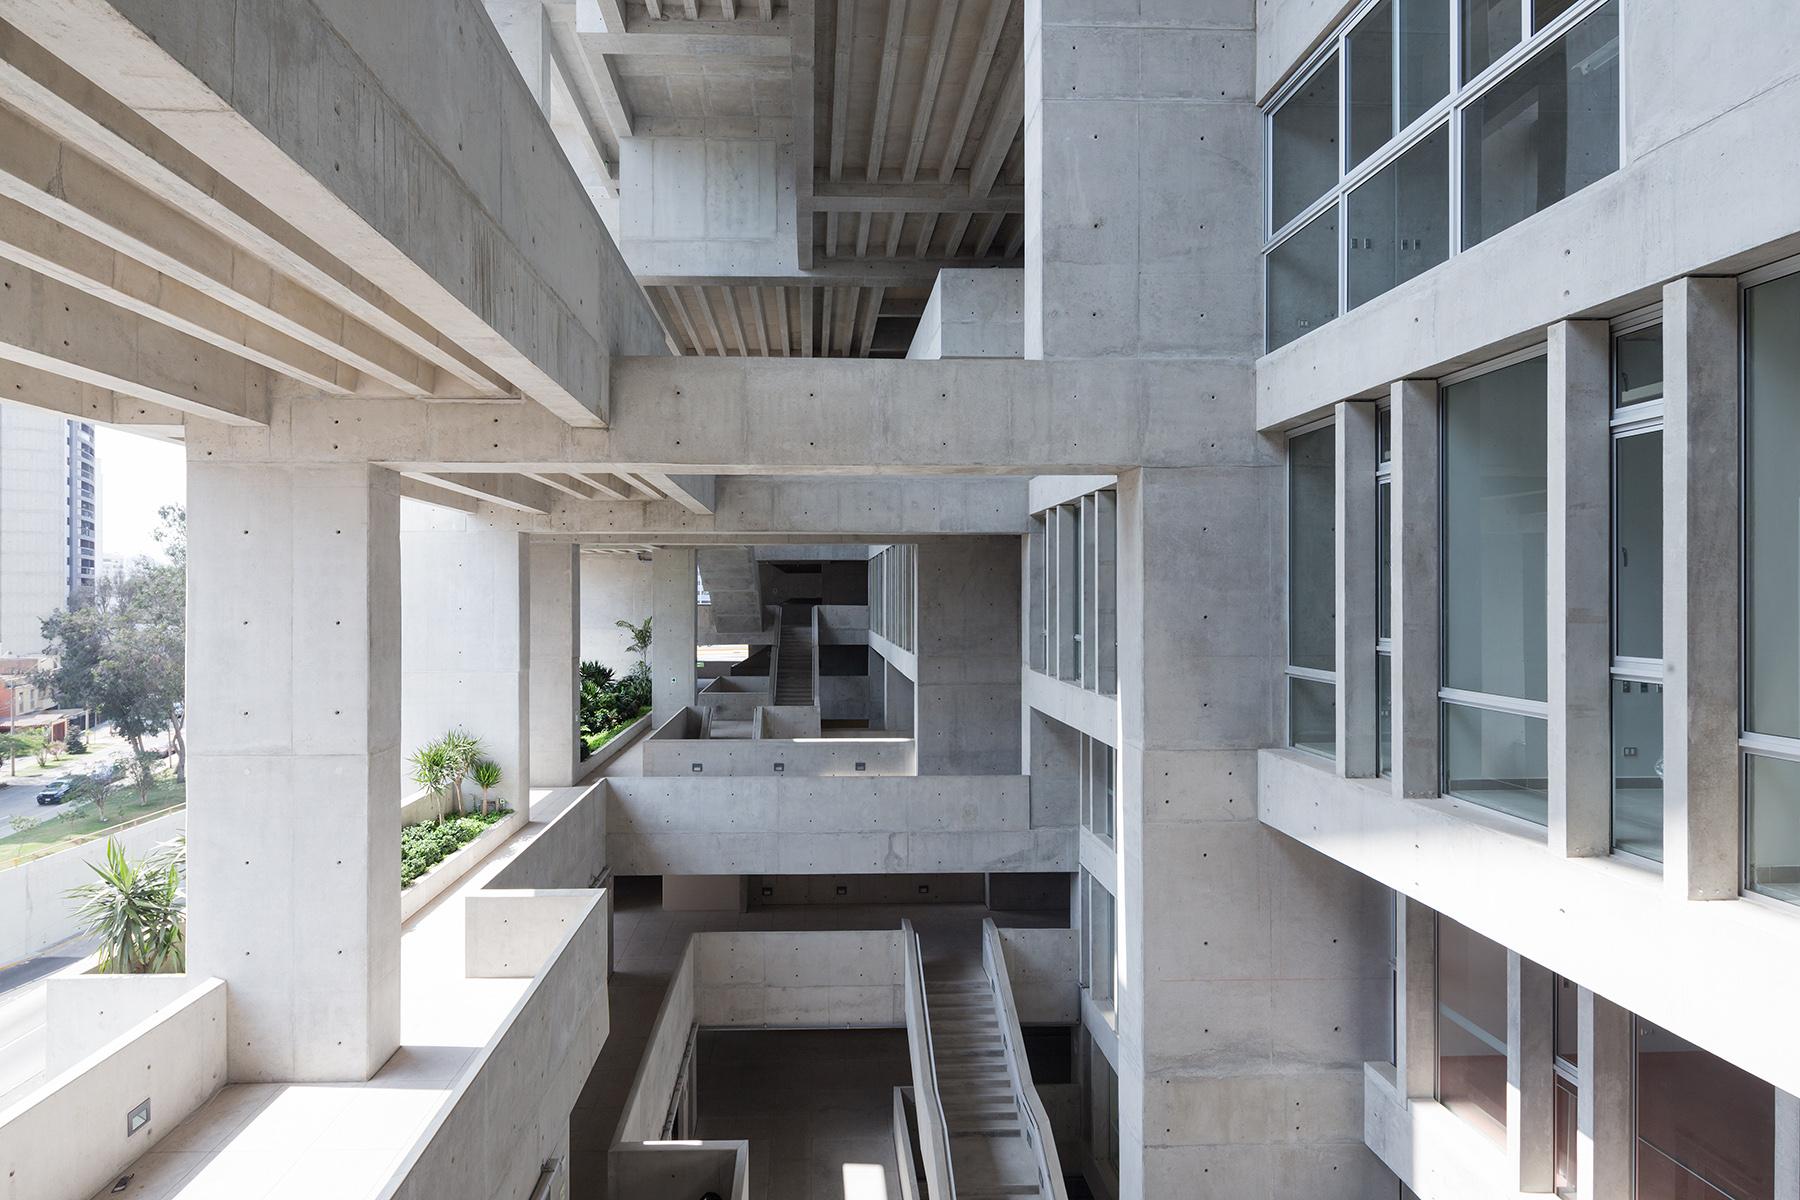 Utec lima campus architect magazine grafton architects for Grafton architects